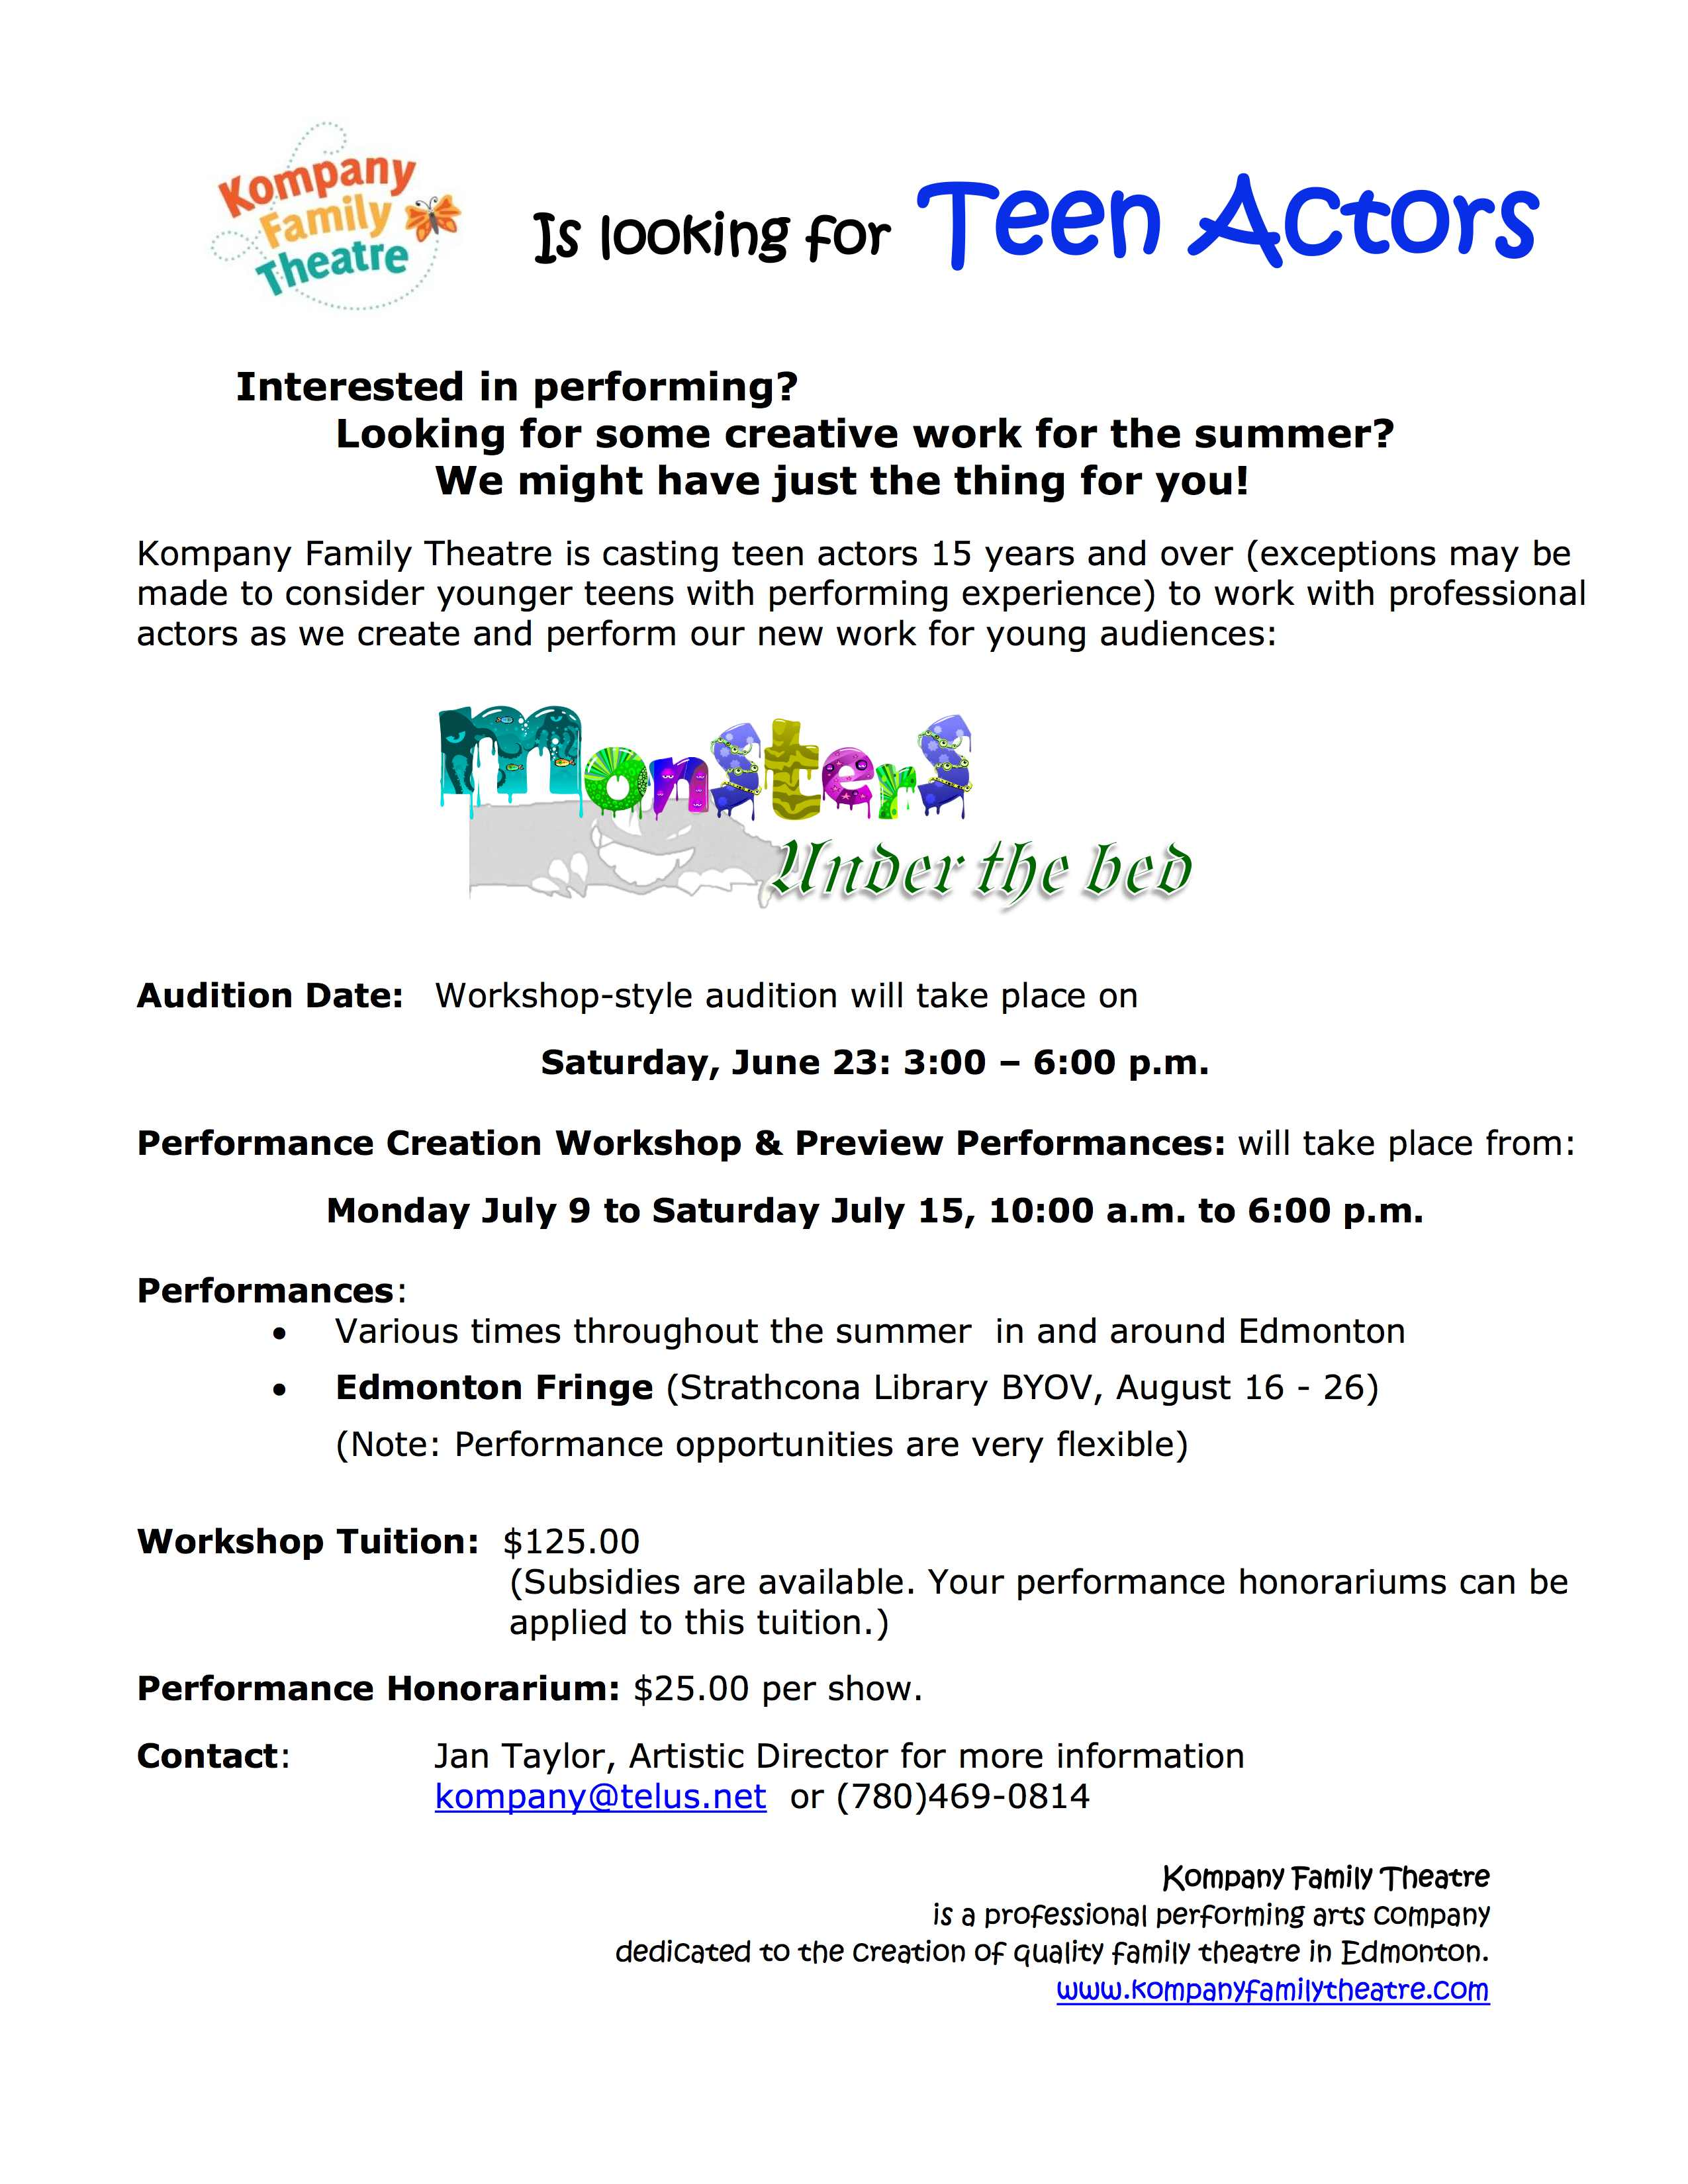 Workshops Archives - Page 33 of 37 - Theatre AlbertaTheatre Alberta